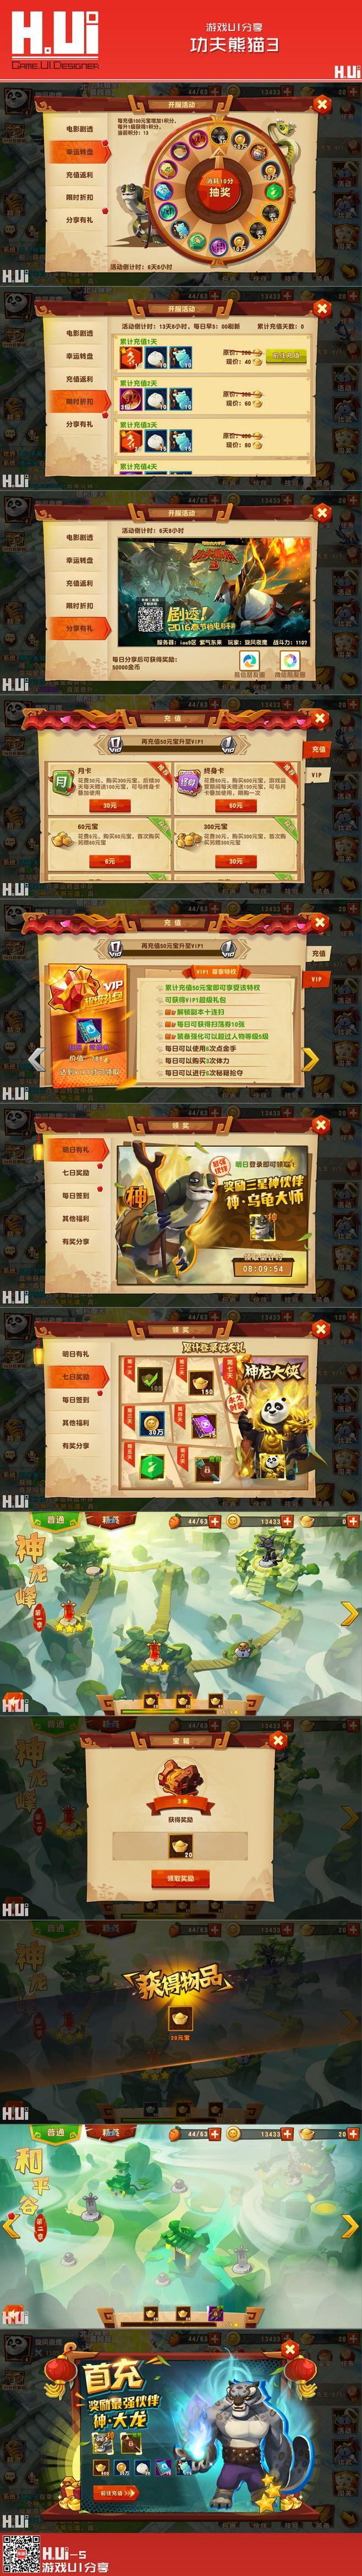 Kung Fu Panda 3 game hand travel UI # #